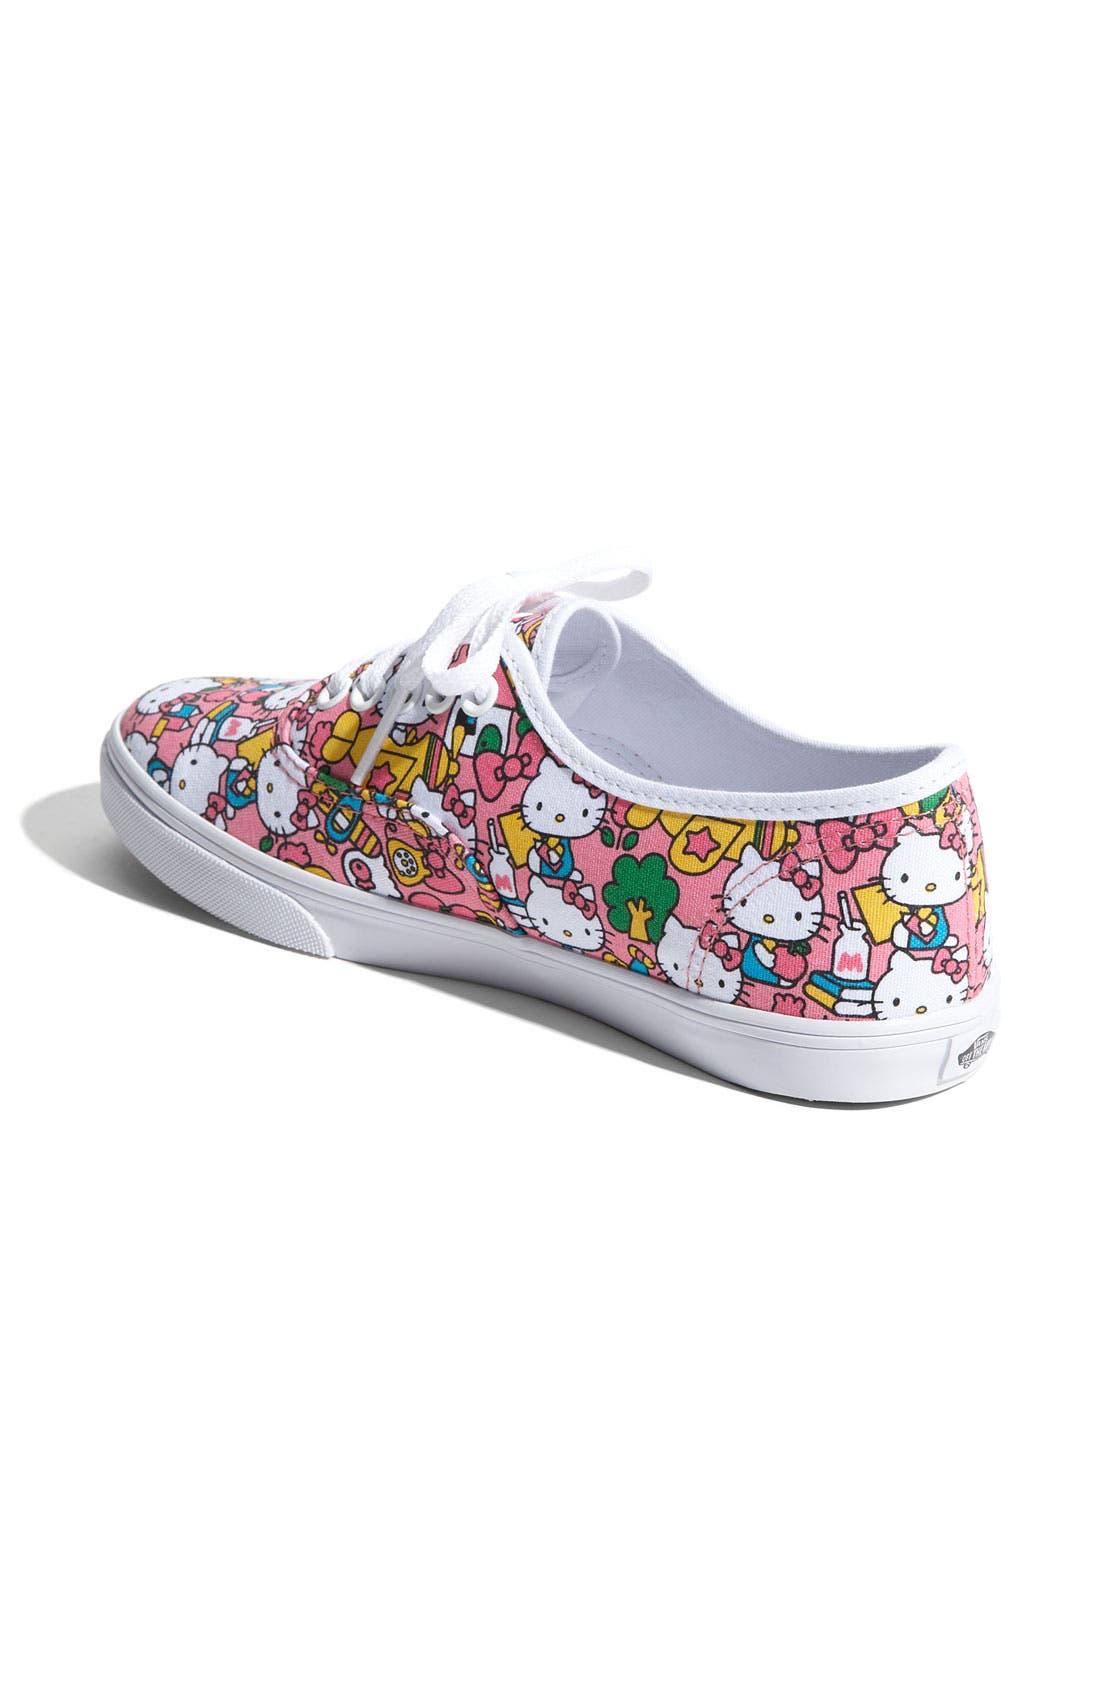 Alternate Image 2  - Vans 'Lo Pro - Hello Kitty®' Sneaker (Women) (Limited Edition)